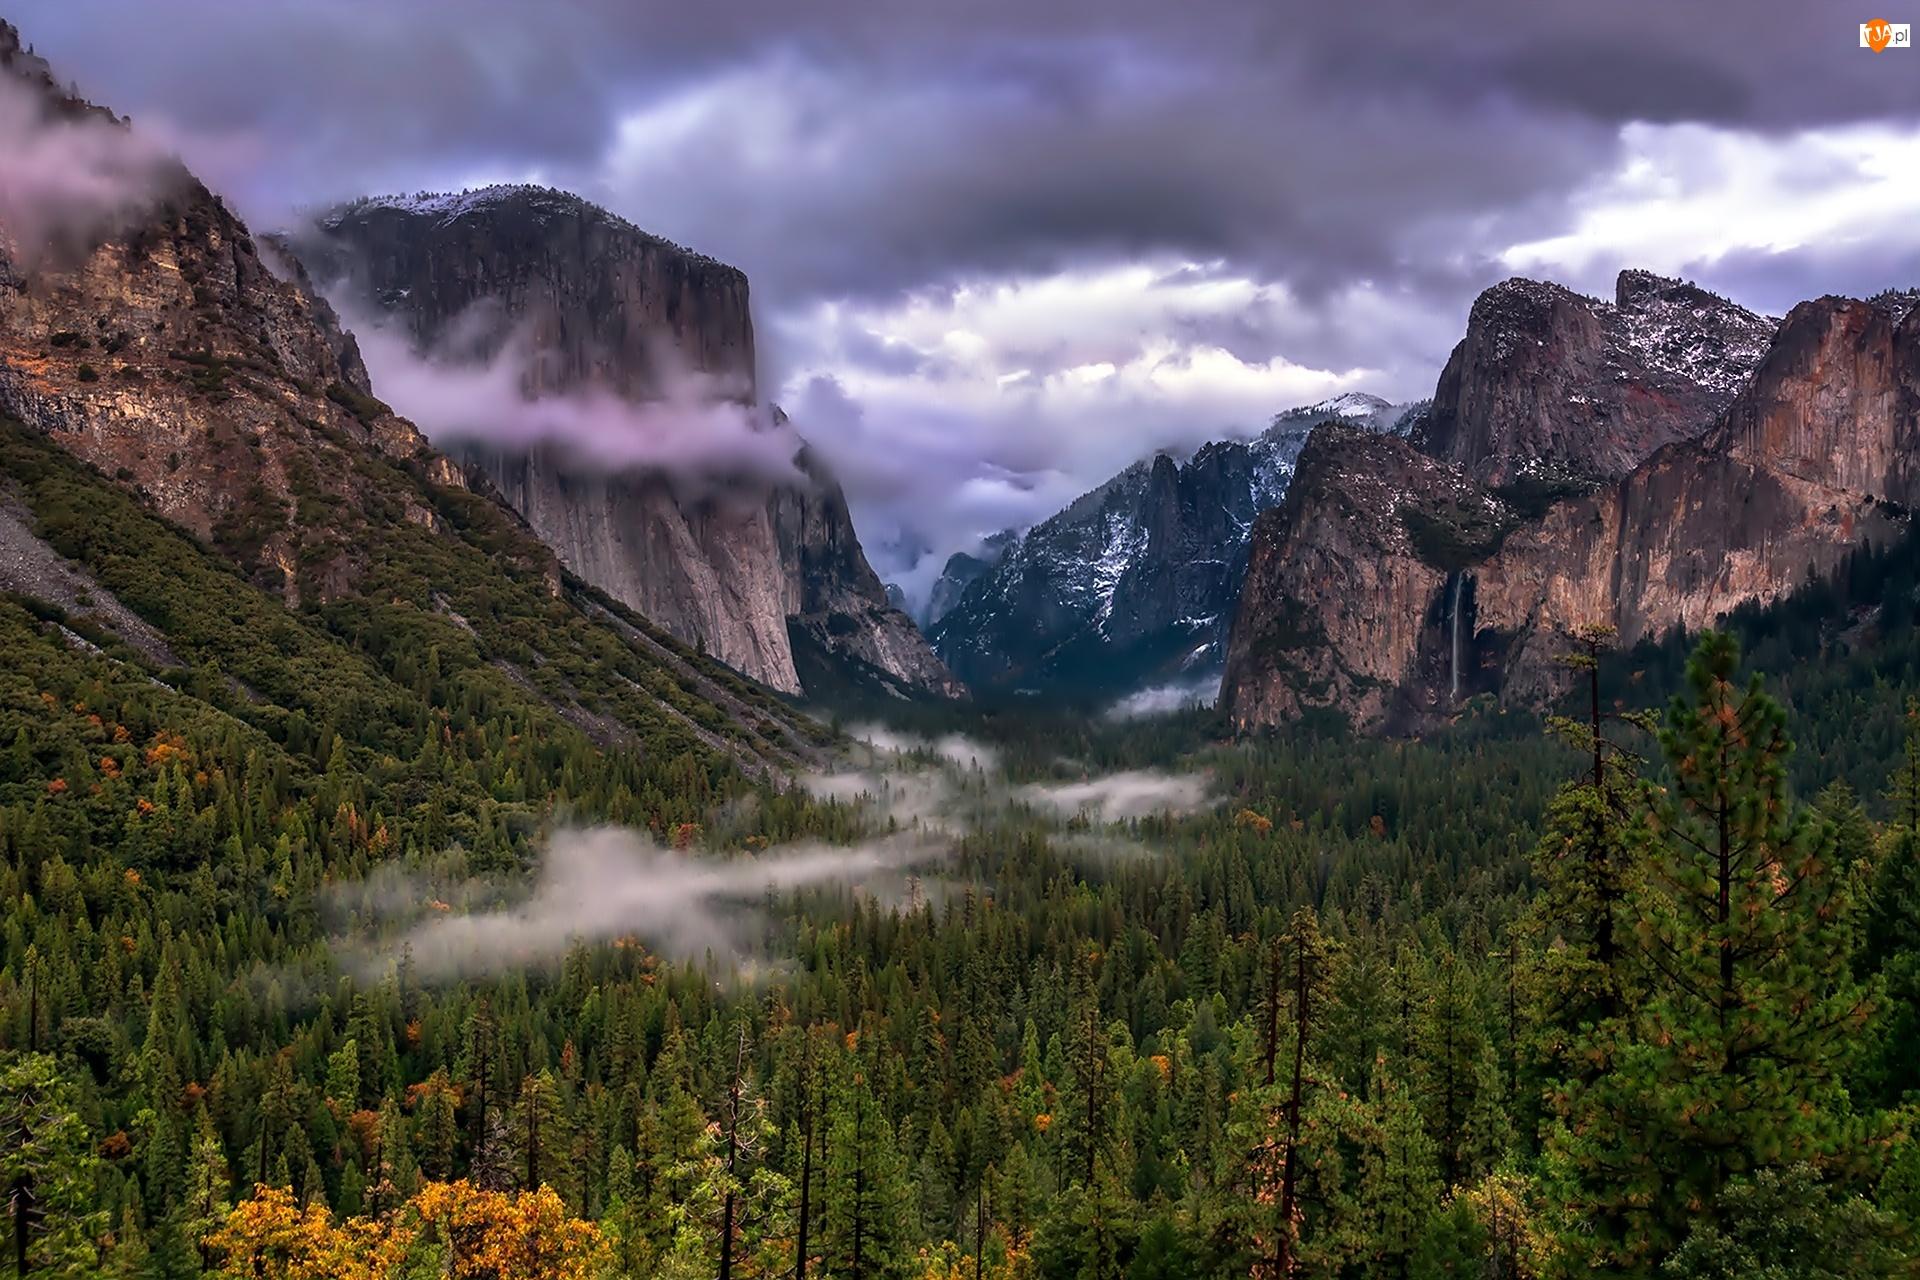 Park Narodowy Yosemite, Lasy, Stany Zjednoczone, Chmury, Stan Kalifornia, Góry